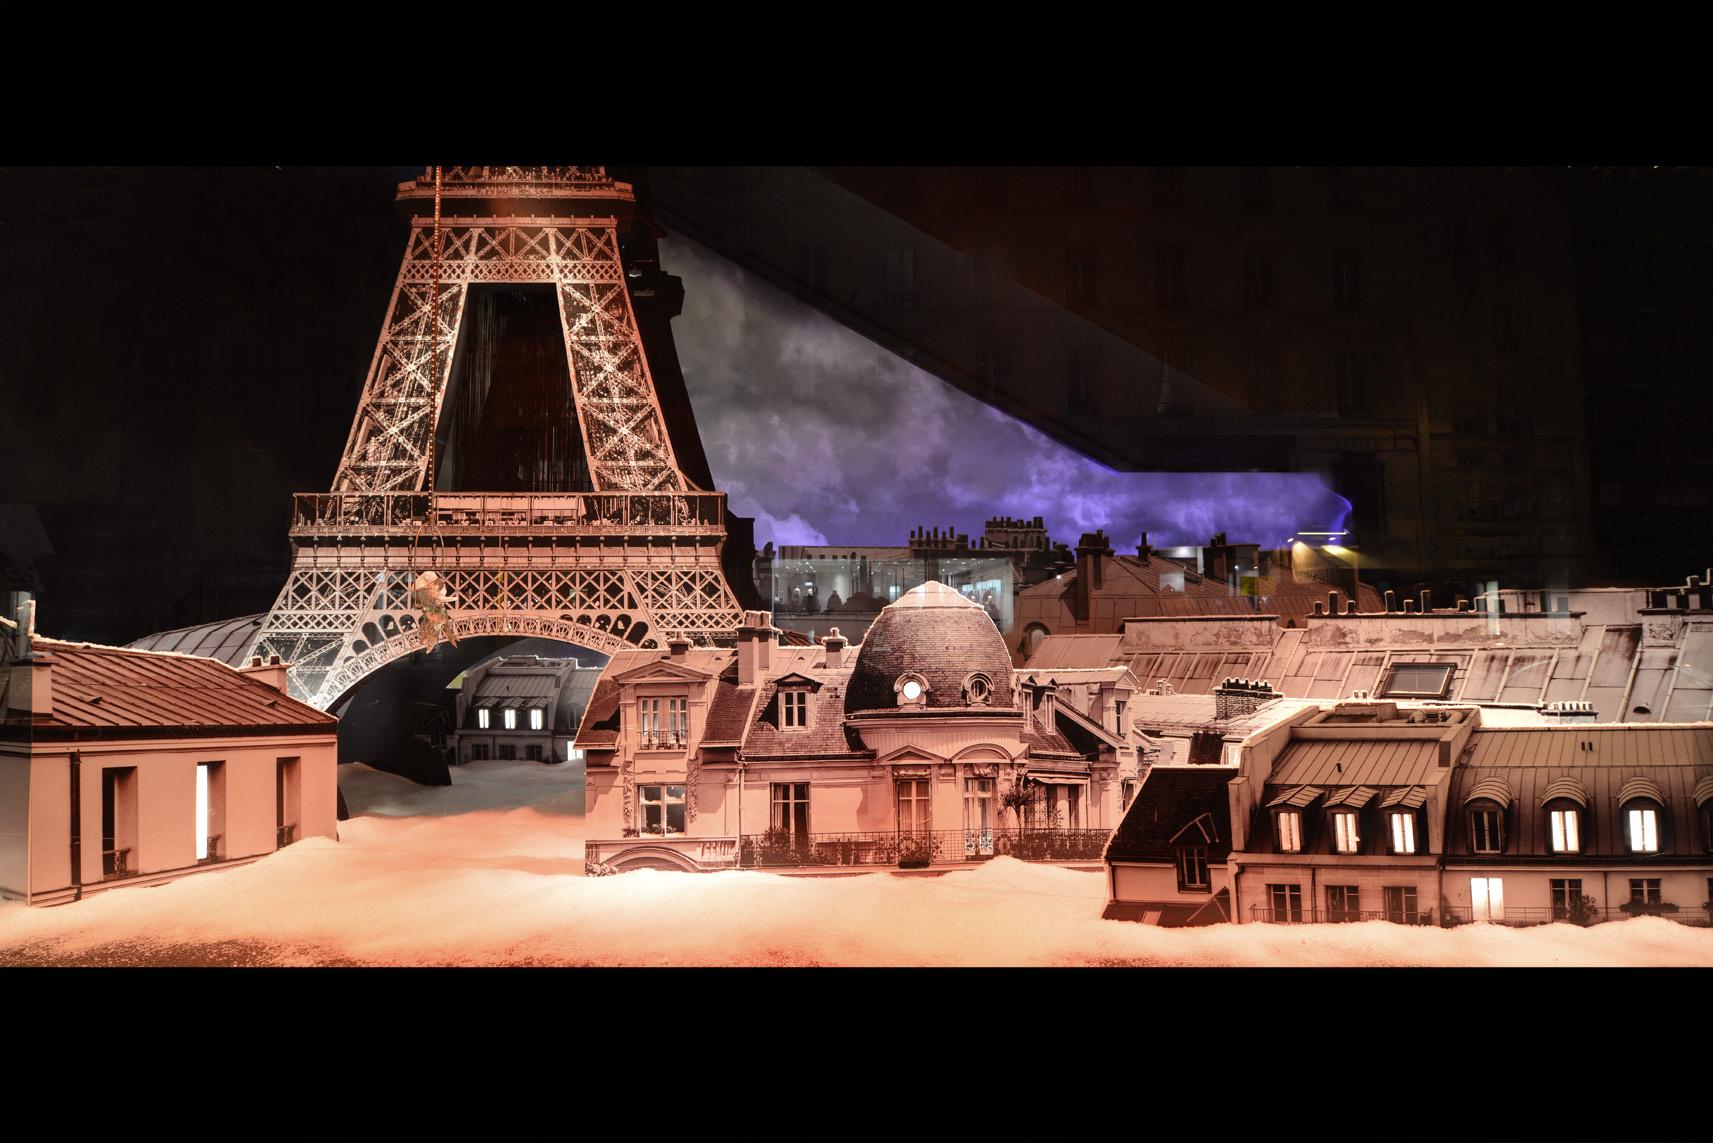 #B25919 Maryo's Bazaar Vitrine Tour Eiffel Noel 2012 Bon Marche  6073 decoration de noel tour eiffel 1713x1143 px @ aertt.com